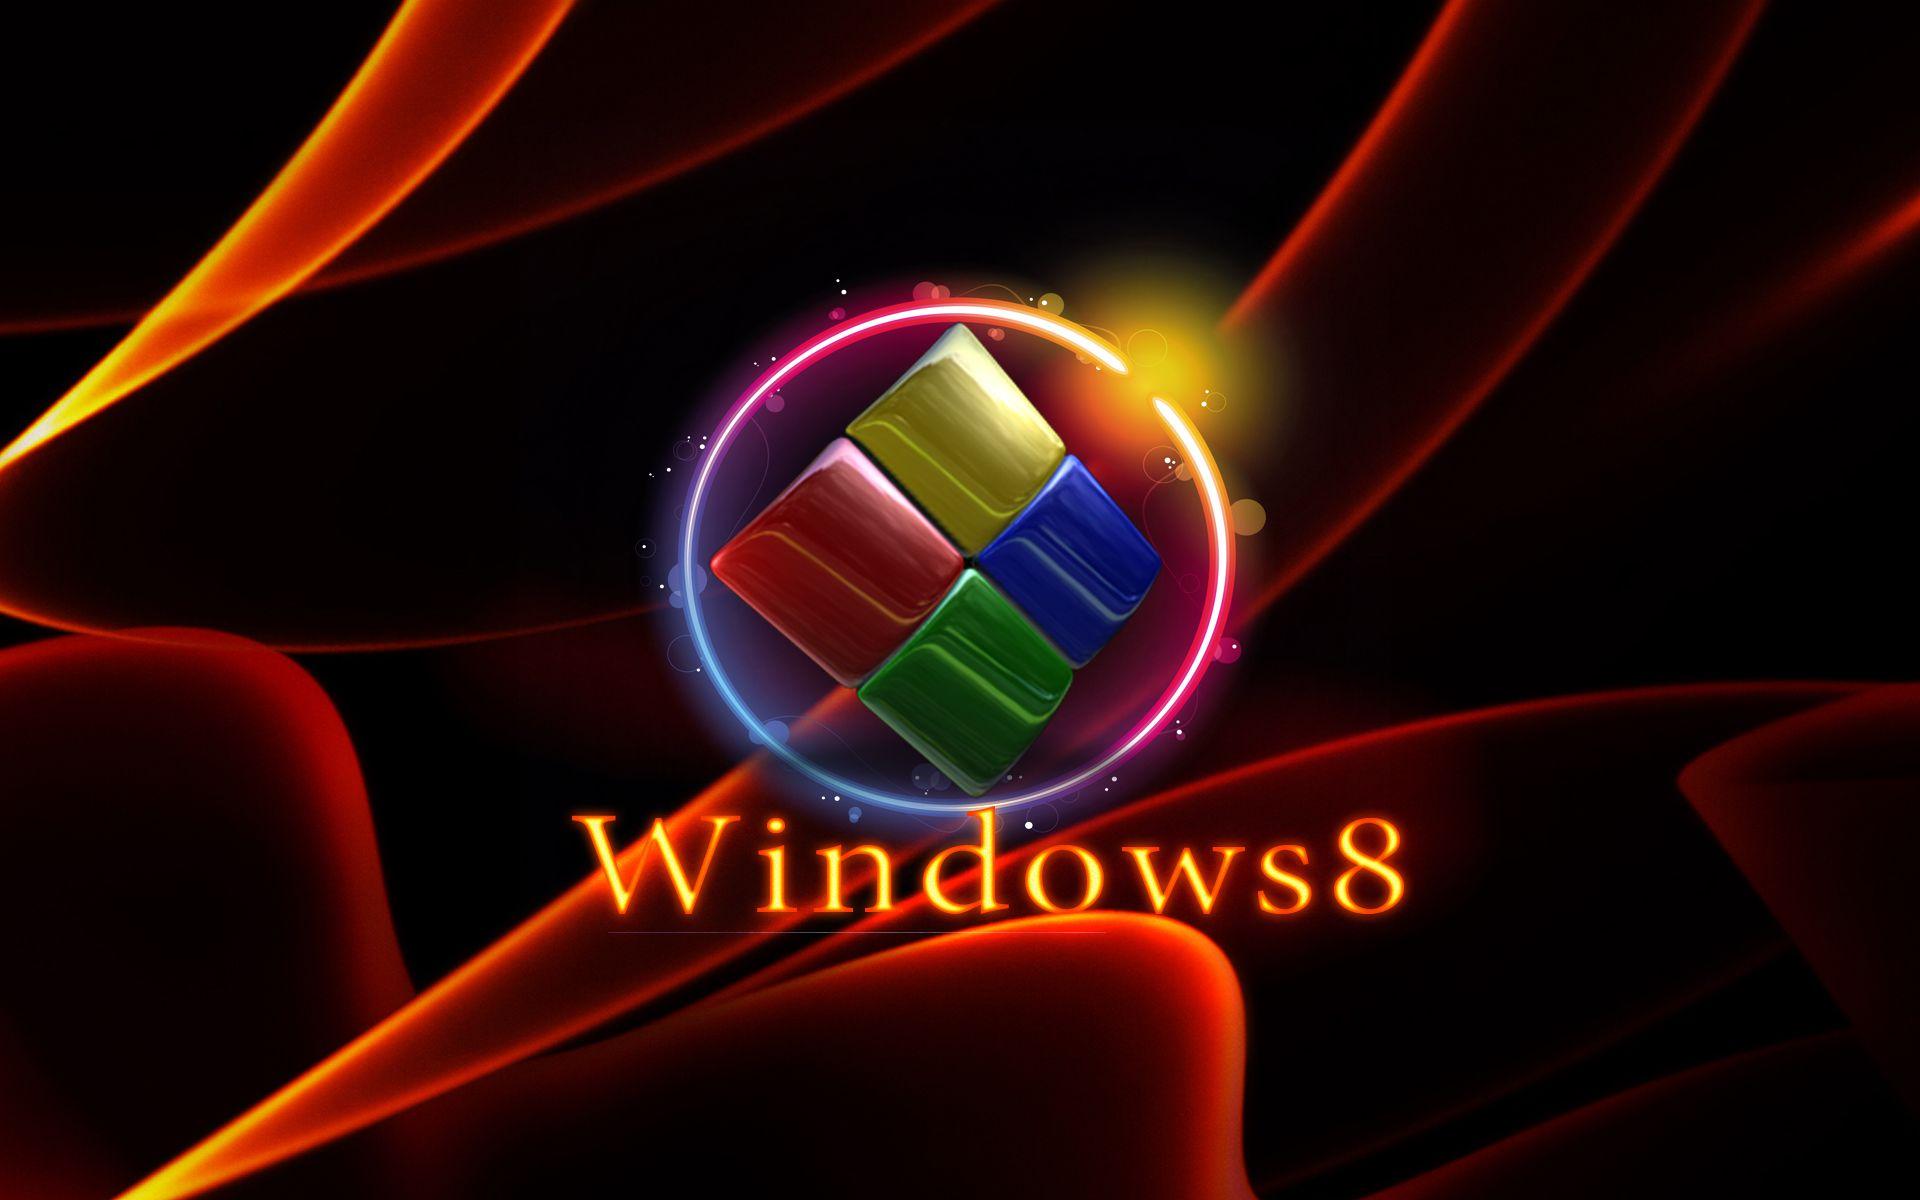 WINDOWS DO PARA FLAMENGO BAIXAR TEMA XP GRATIS